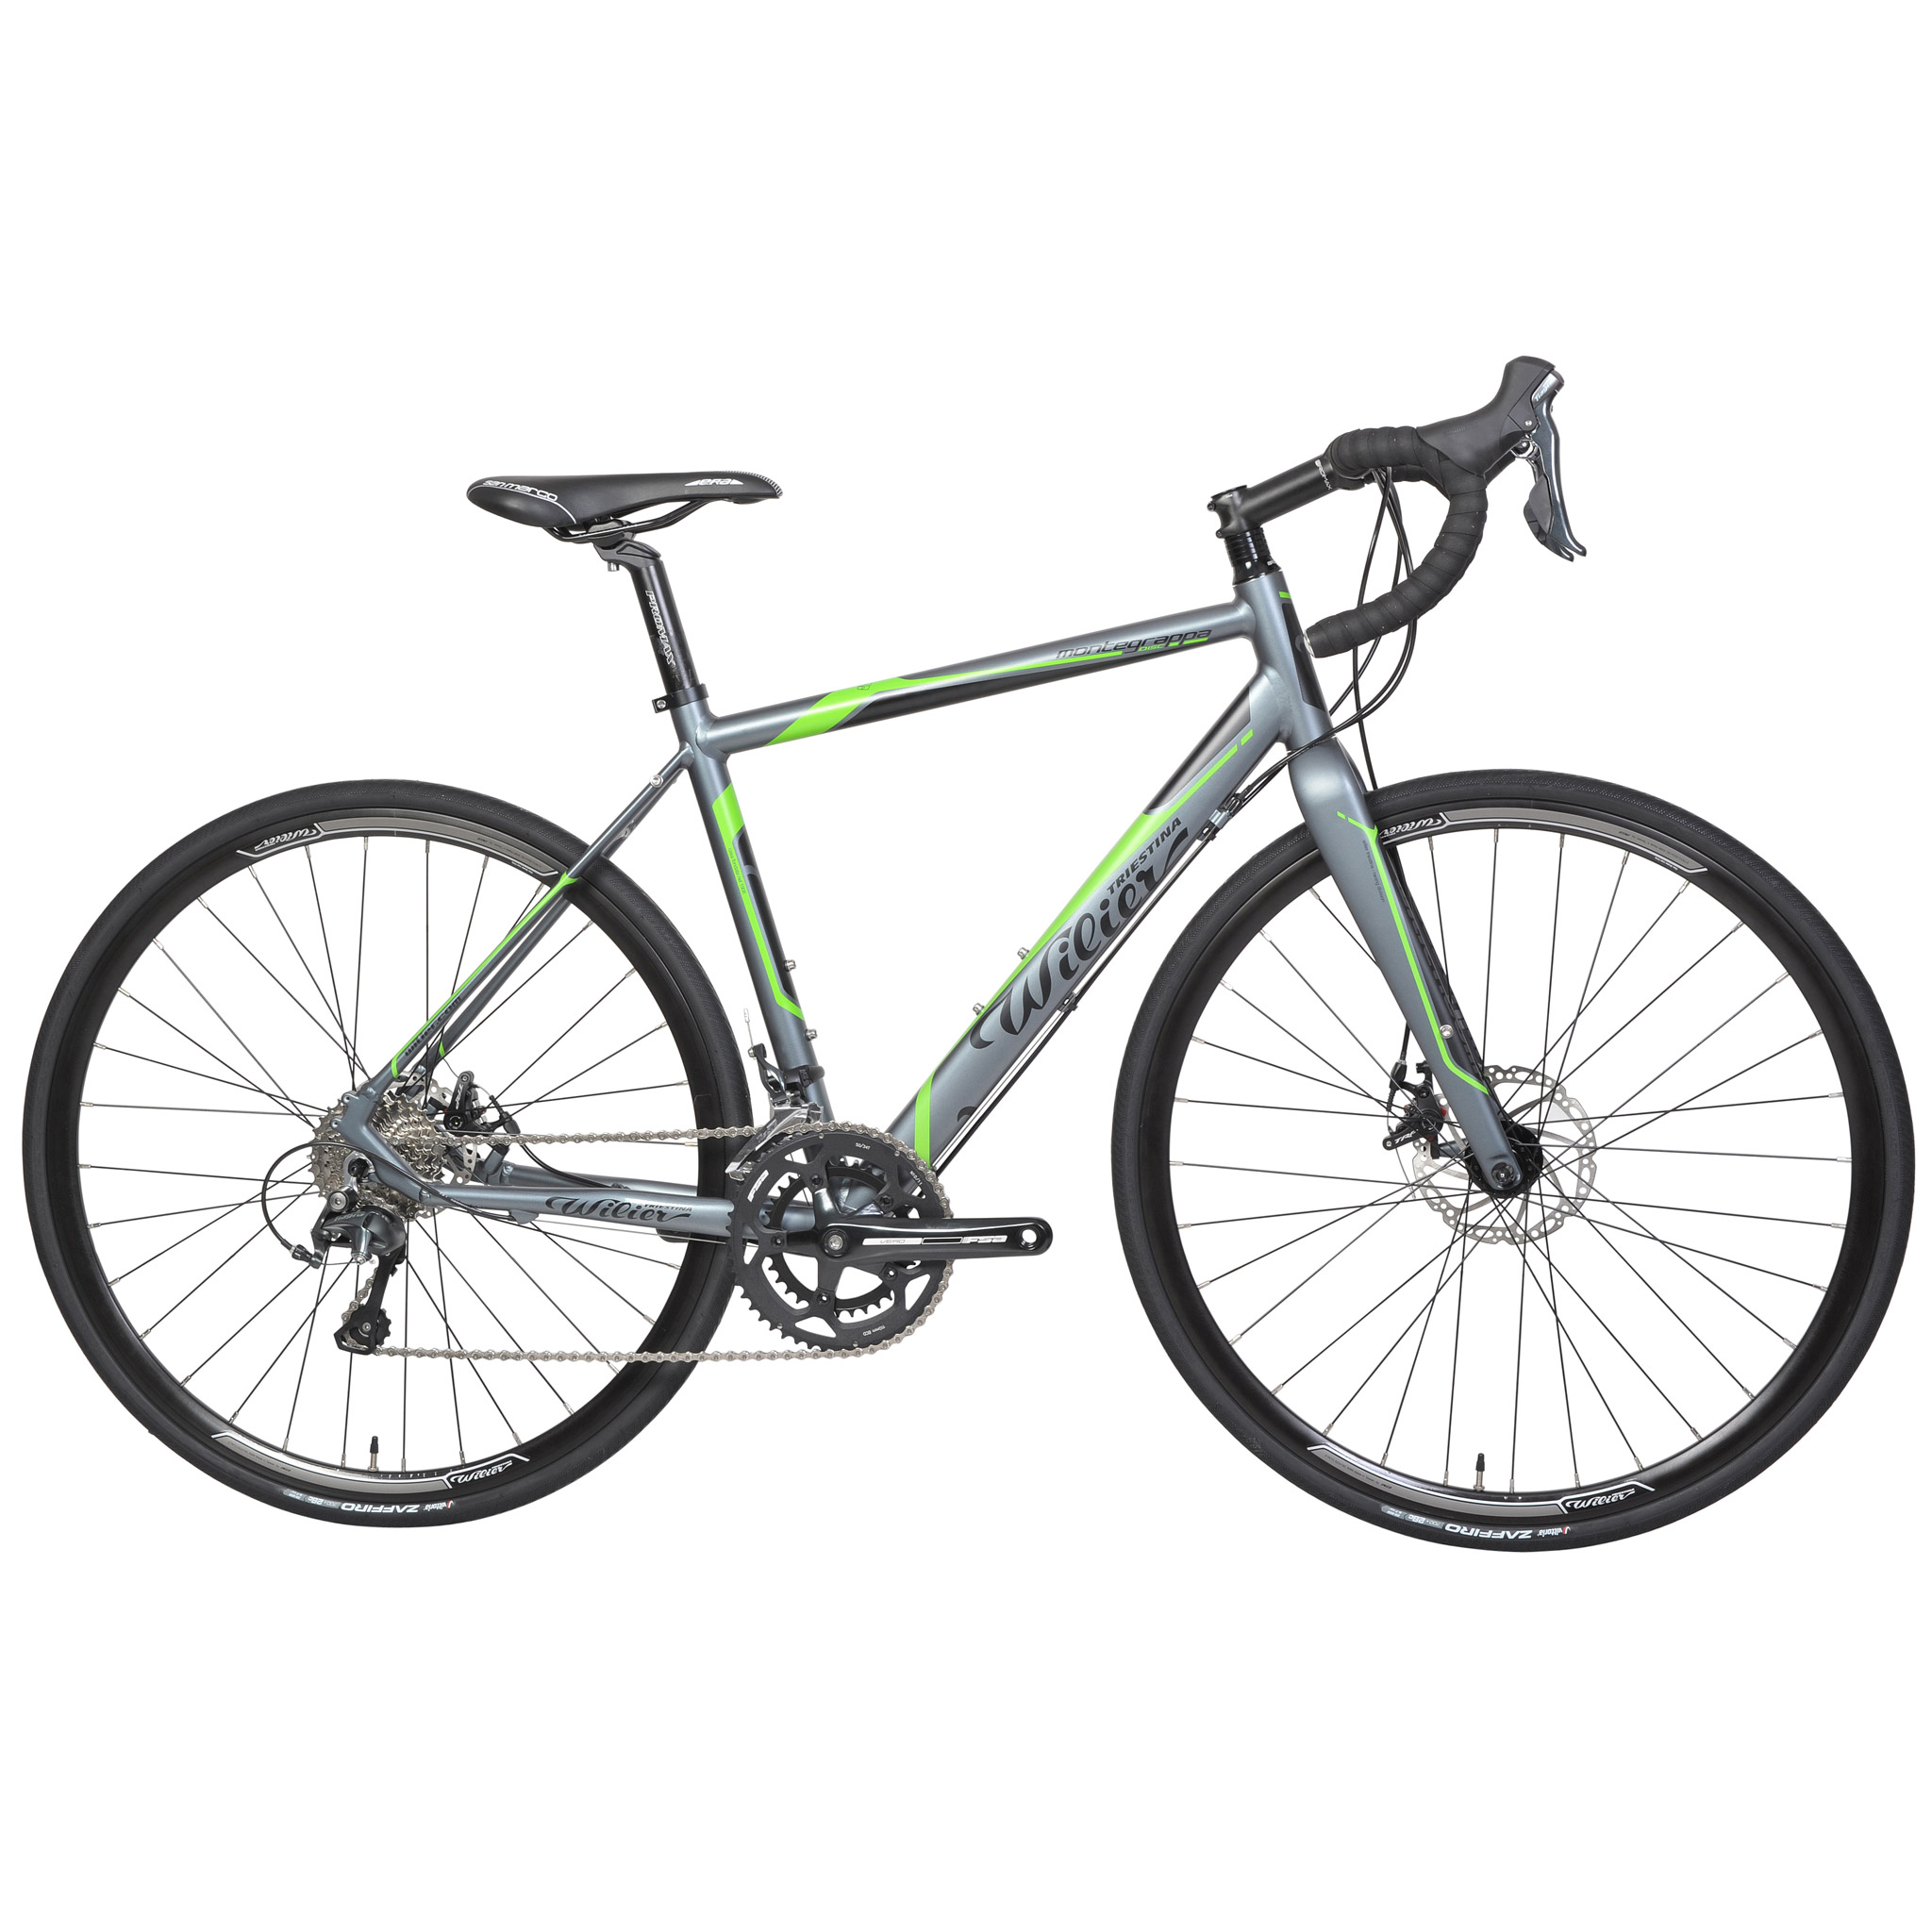 Bicicleta de carrera WILIER TRIESTINA MONTEGRAPPA DISC Shimano Tiagra 4700 34/50 2016